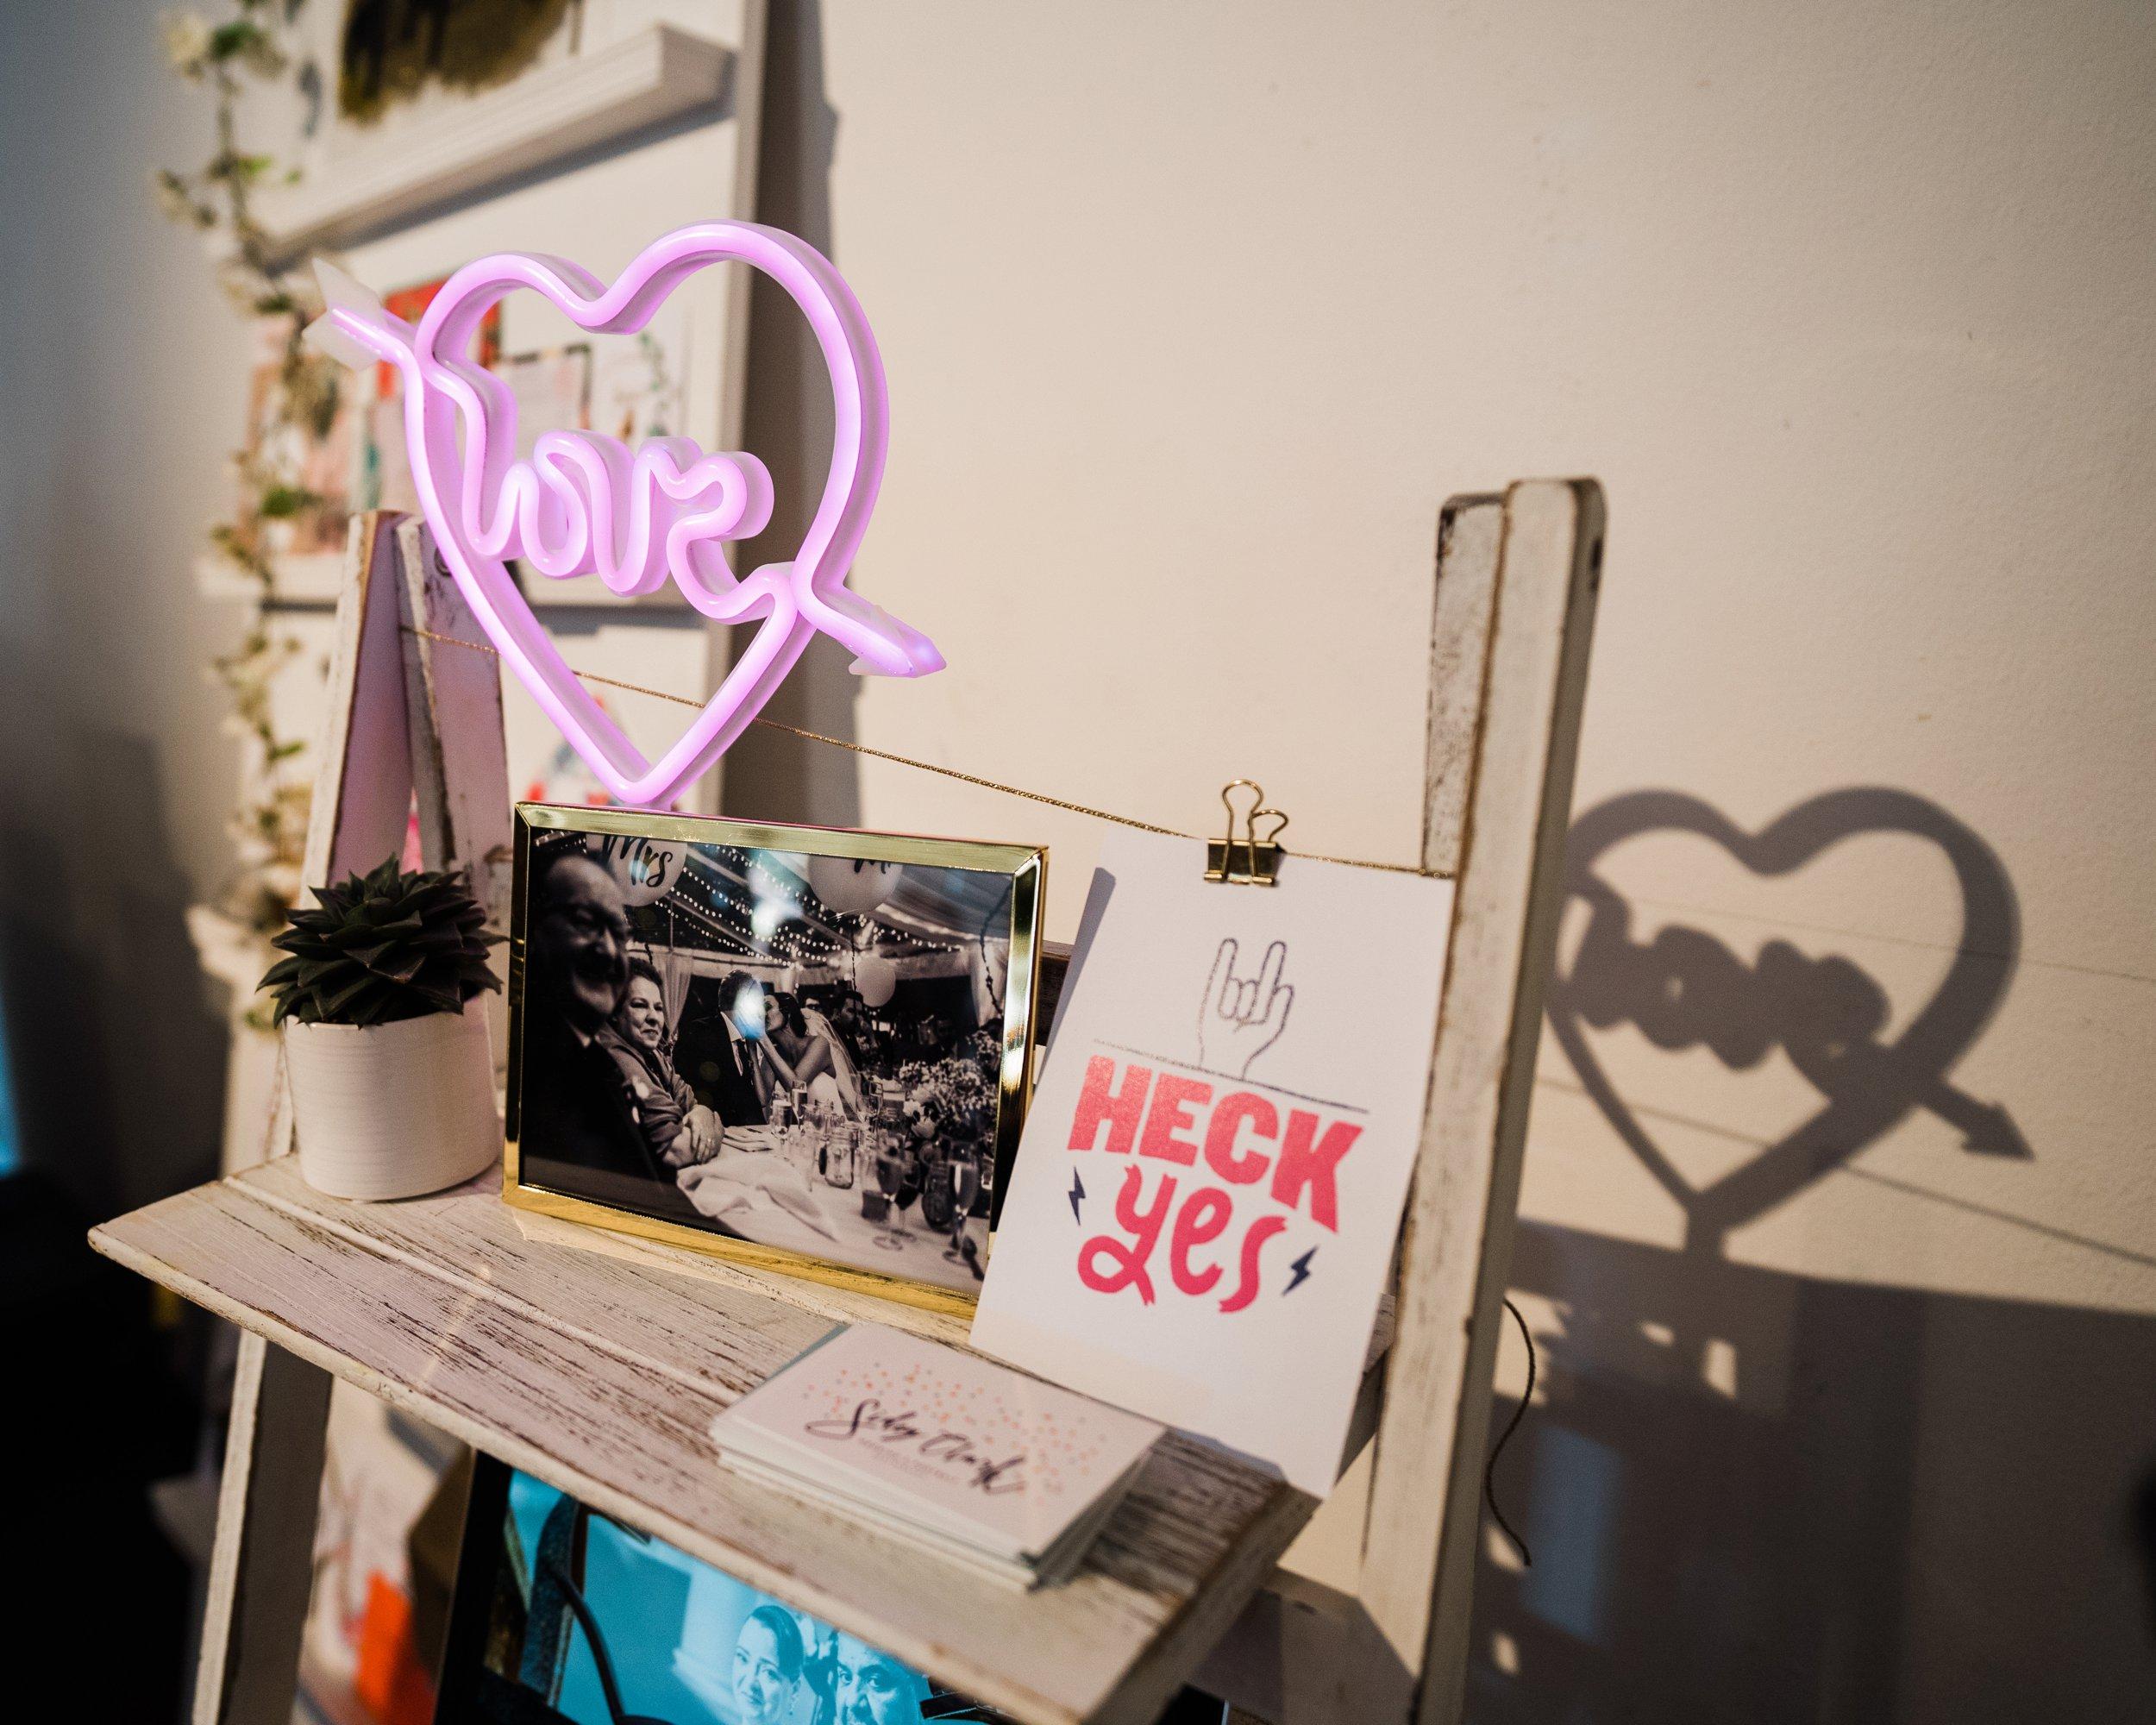 The UN-WEDDING SHOW 2019 cool bride style modern wedding fair Birmingham Fazeley Studios 00019.jpg